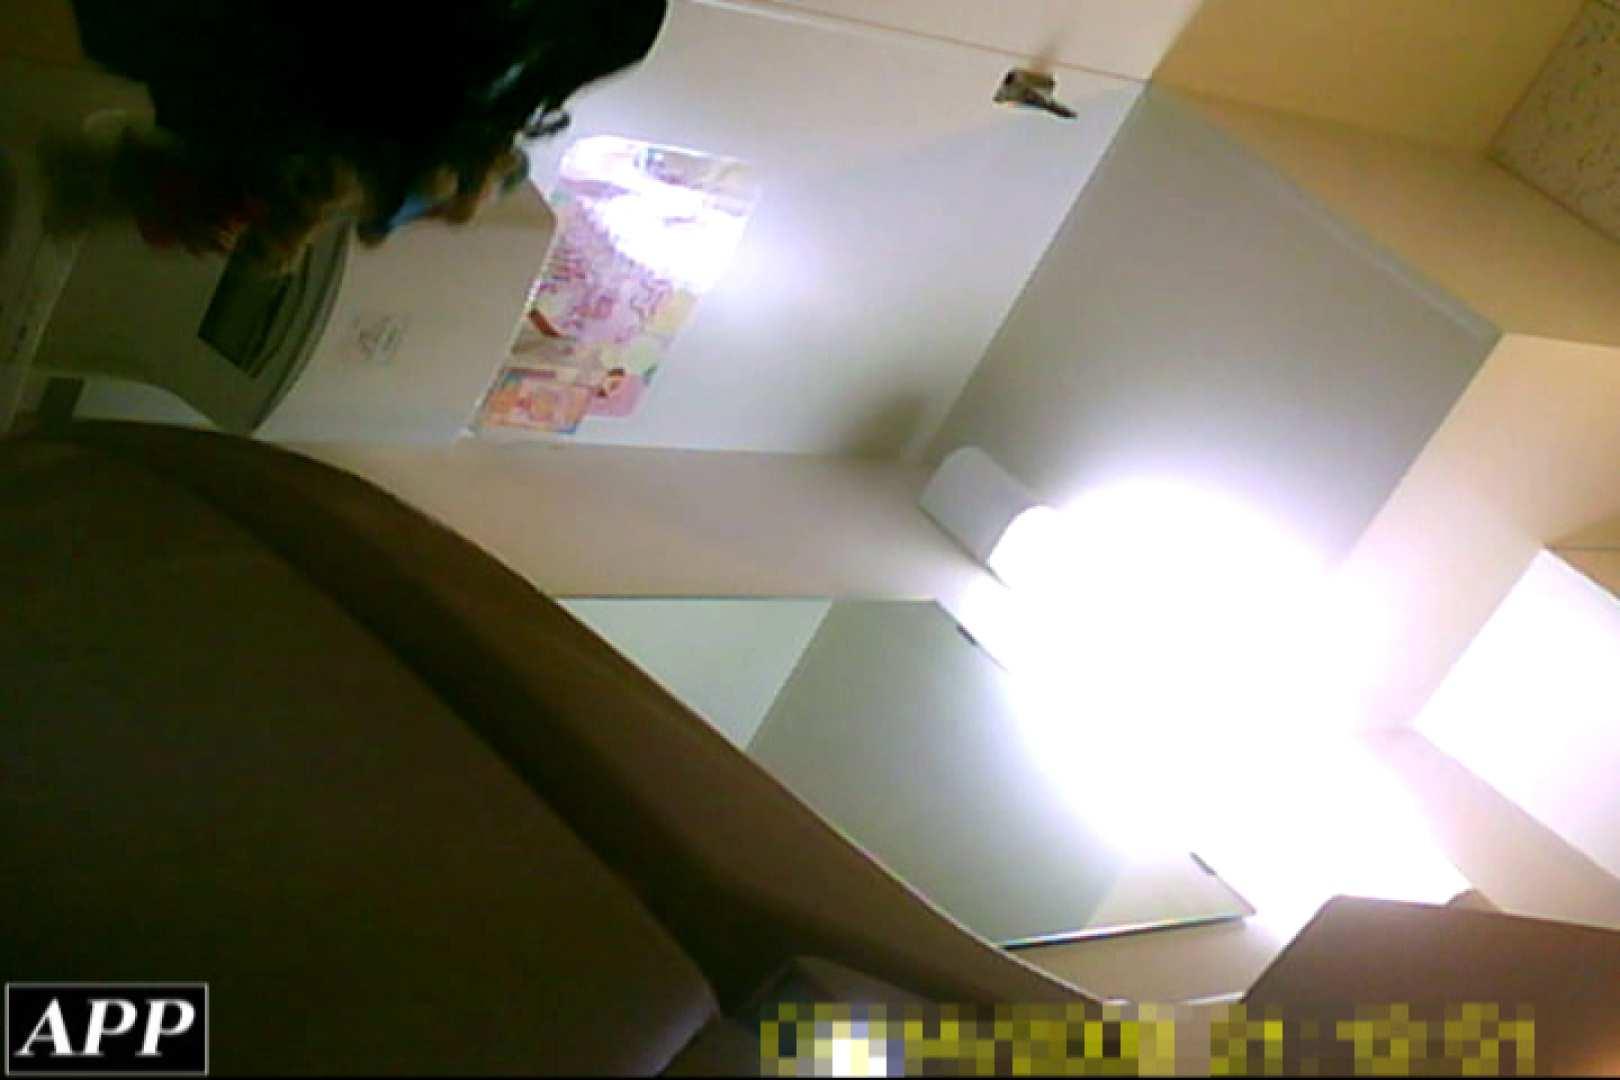 3視点洗面所 vol.79 OLハメ撮り  89Pix 60